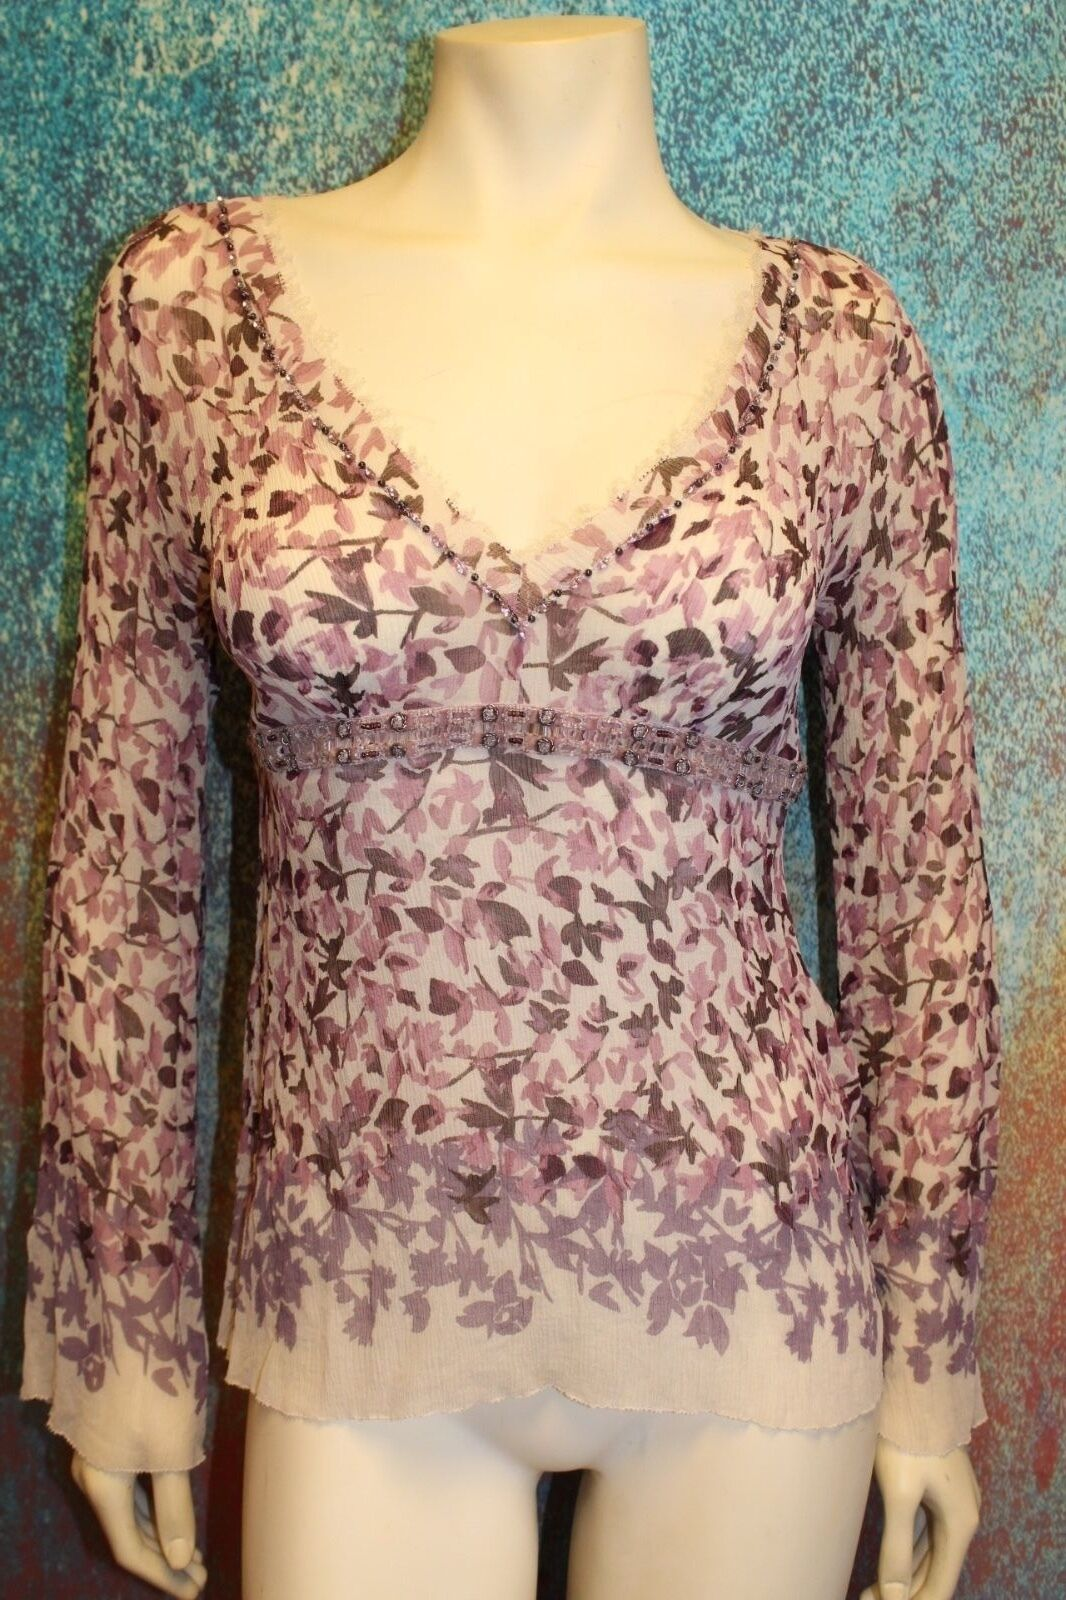 Elie Tahari Top Blouse Sheer 100% Silk, Rosa lila Floral Beaded Lace  Größe M